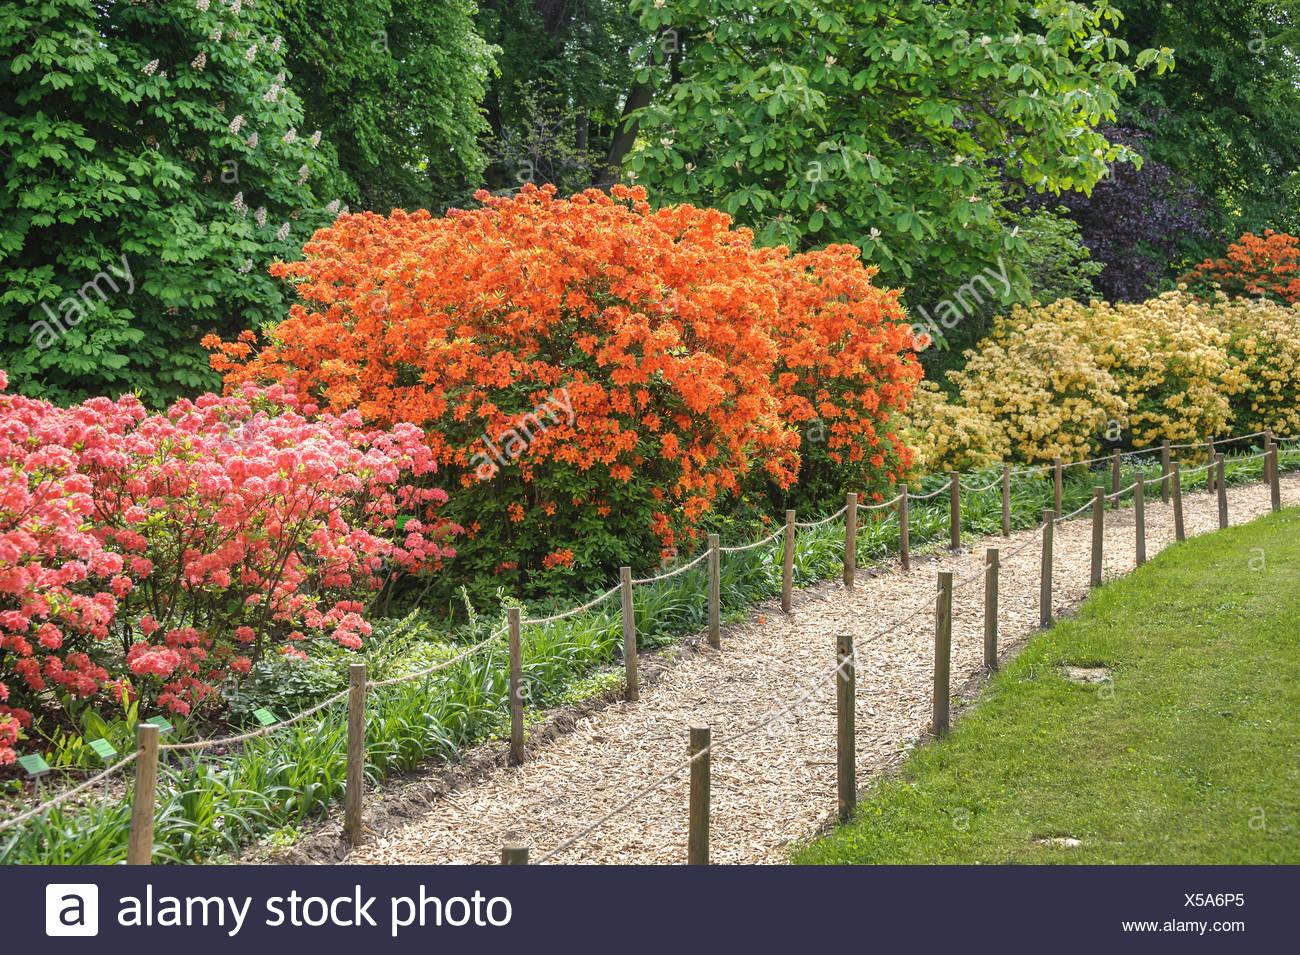 rhododendron (Rhododendron 'Golden Eagle', Rhododendron Golden Eagle), cultivar Golden Eagle, Poland, Niederschlesien, Arboretum Woislowitz - Stock Image